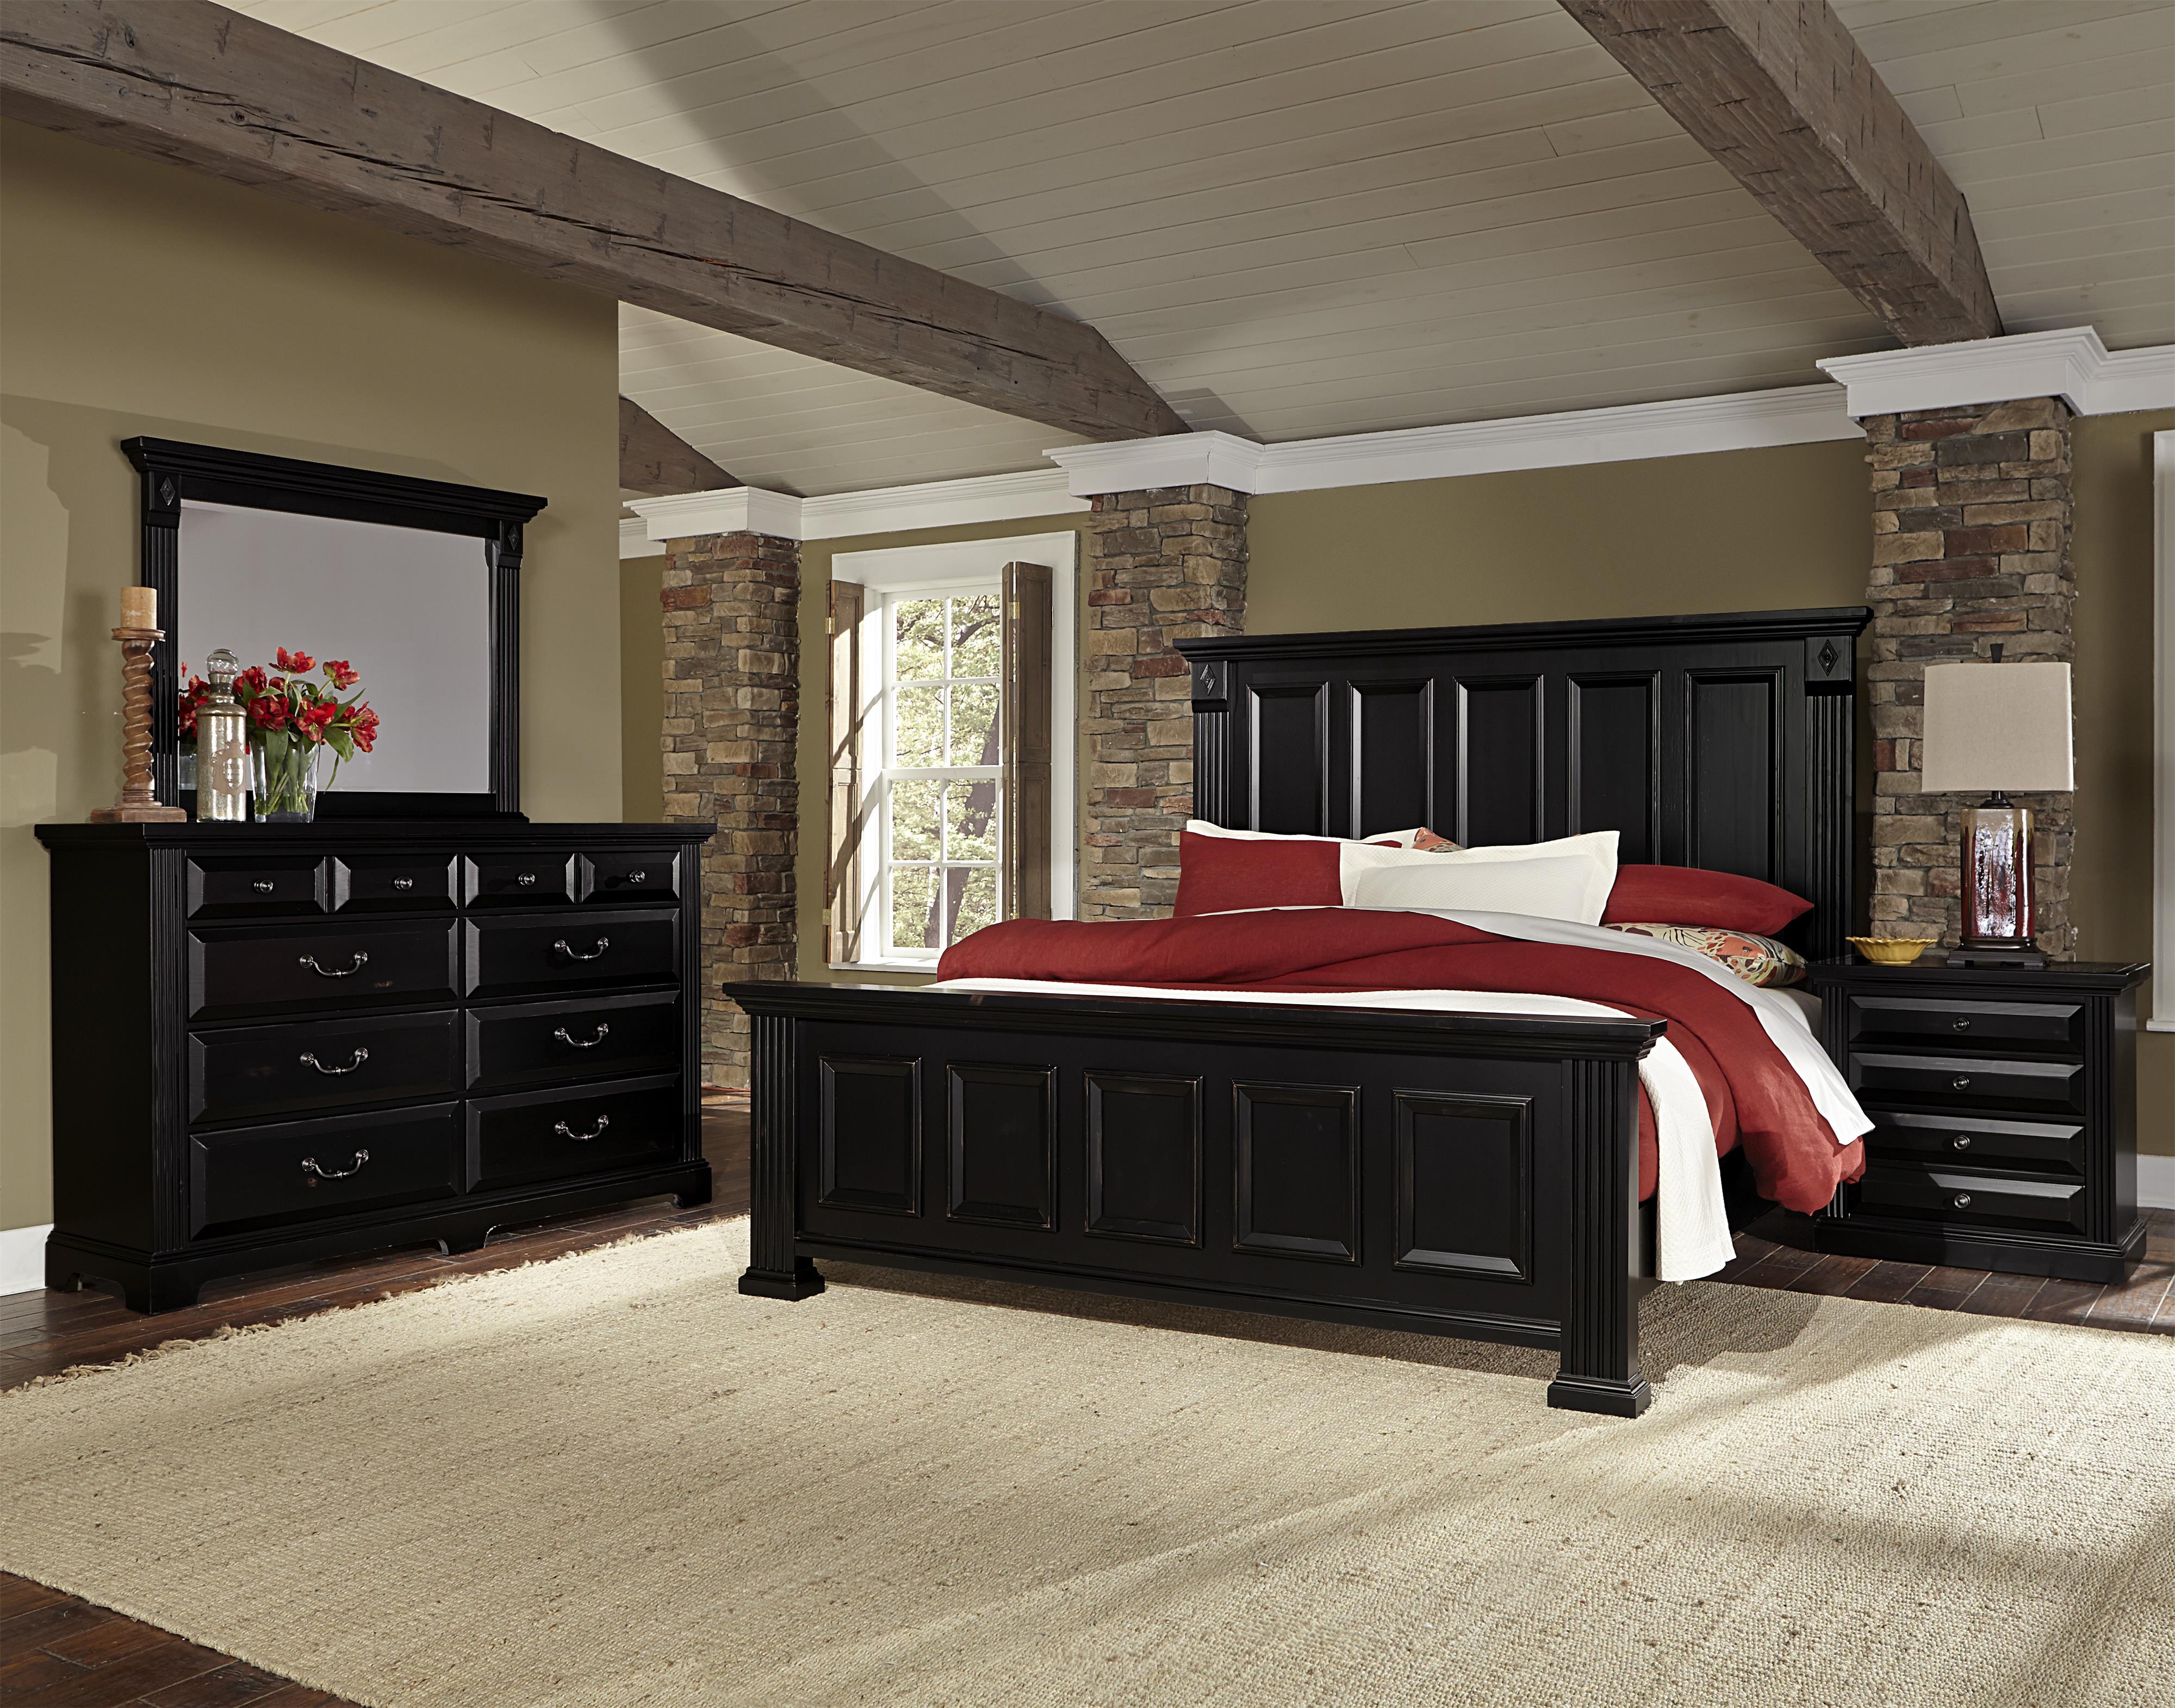 Vaughan Bassett Woodlands King Bedroom Group - Item Number: BB99 K Bedroom Group 1